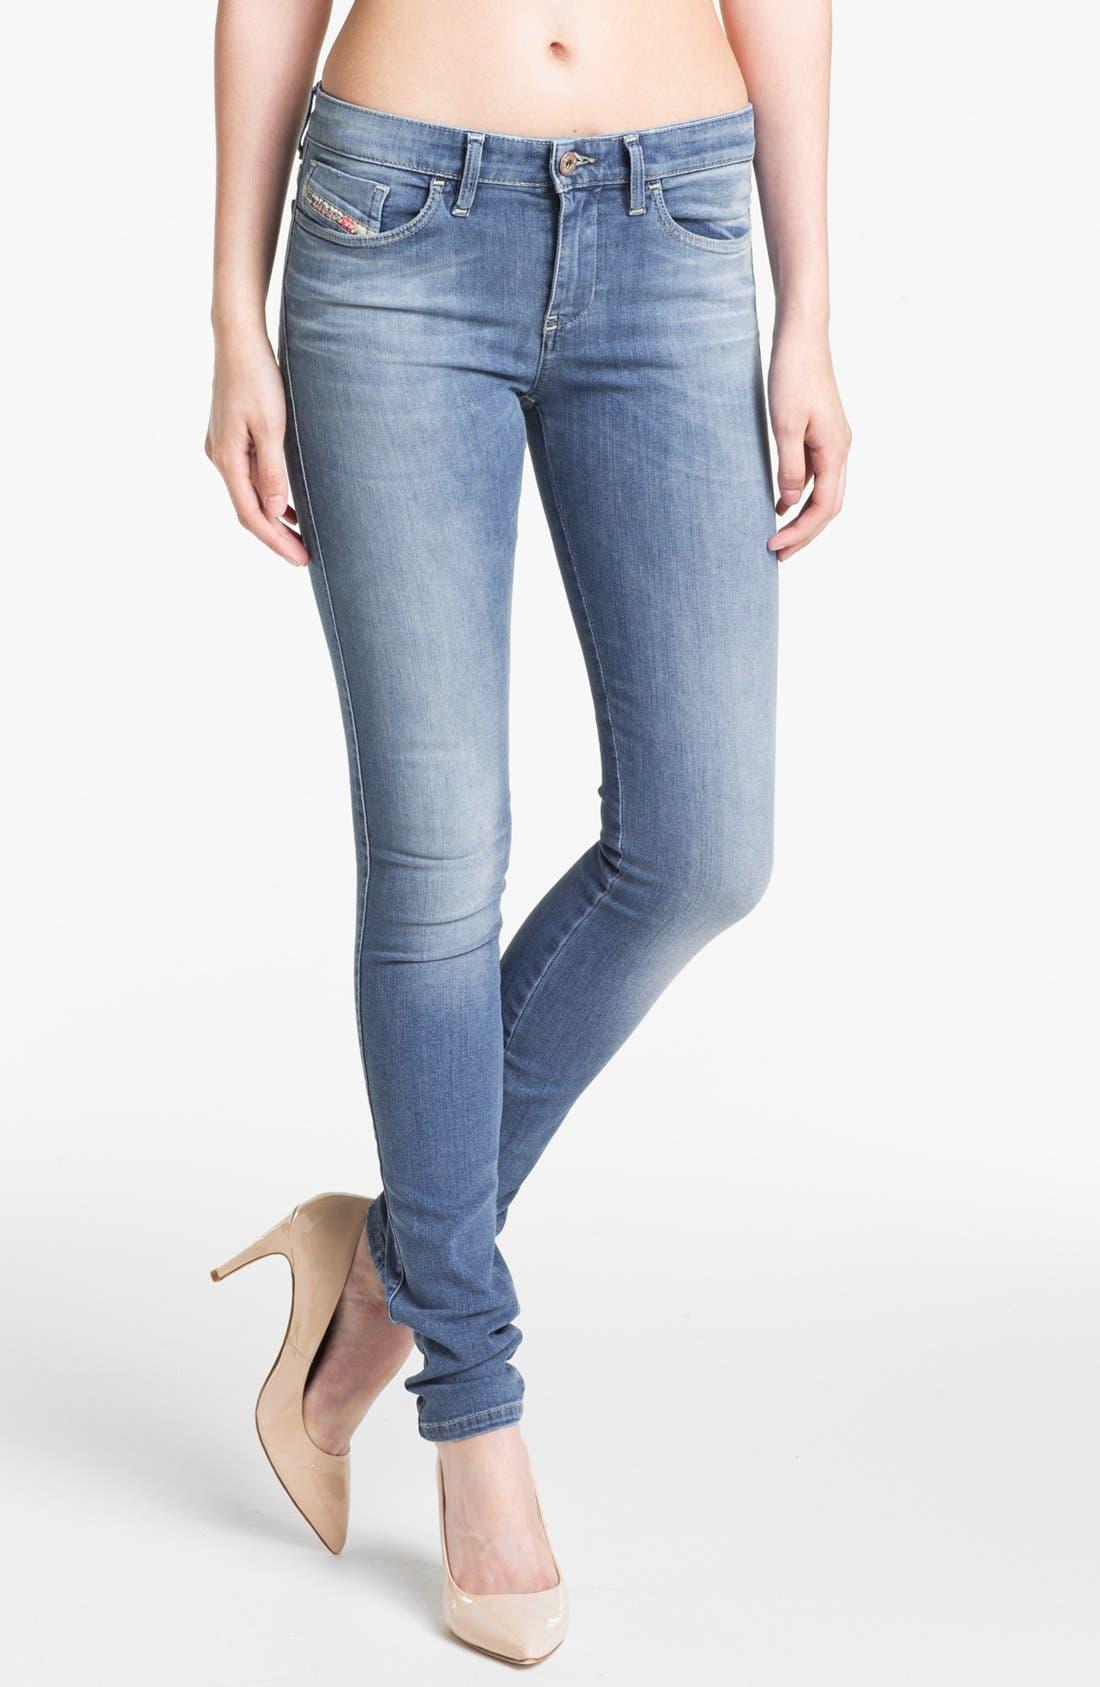 Alternate Image 1 Selected - DIESEL® 'Skinzee' Stretch Skinny Jeans (Light Denim)